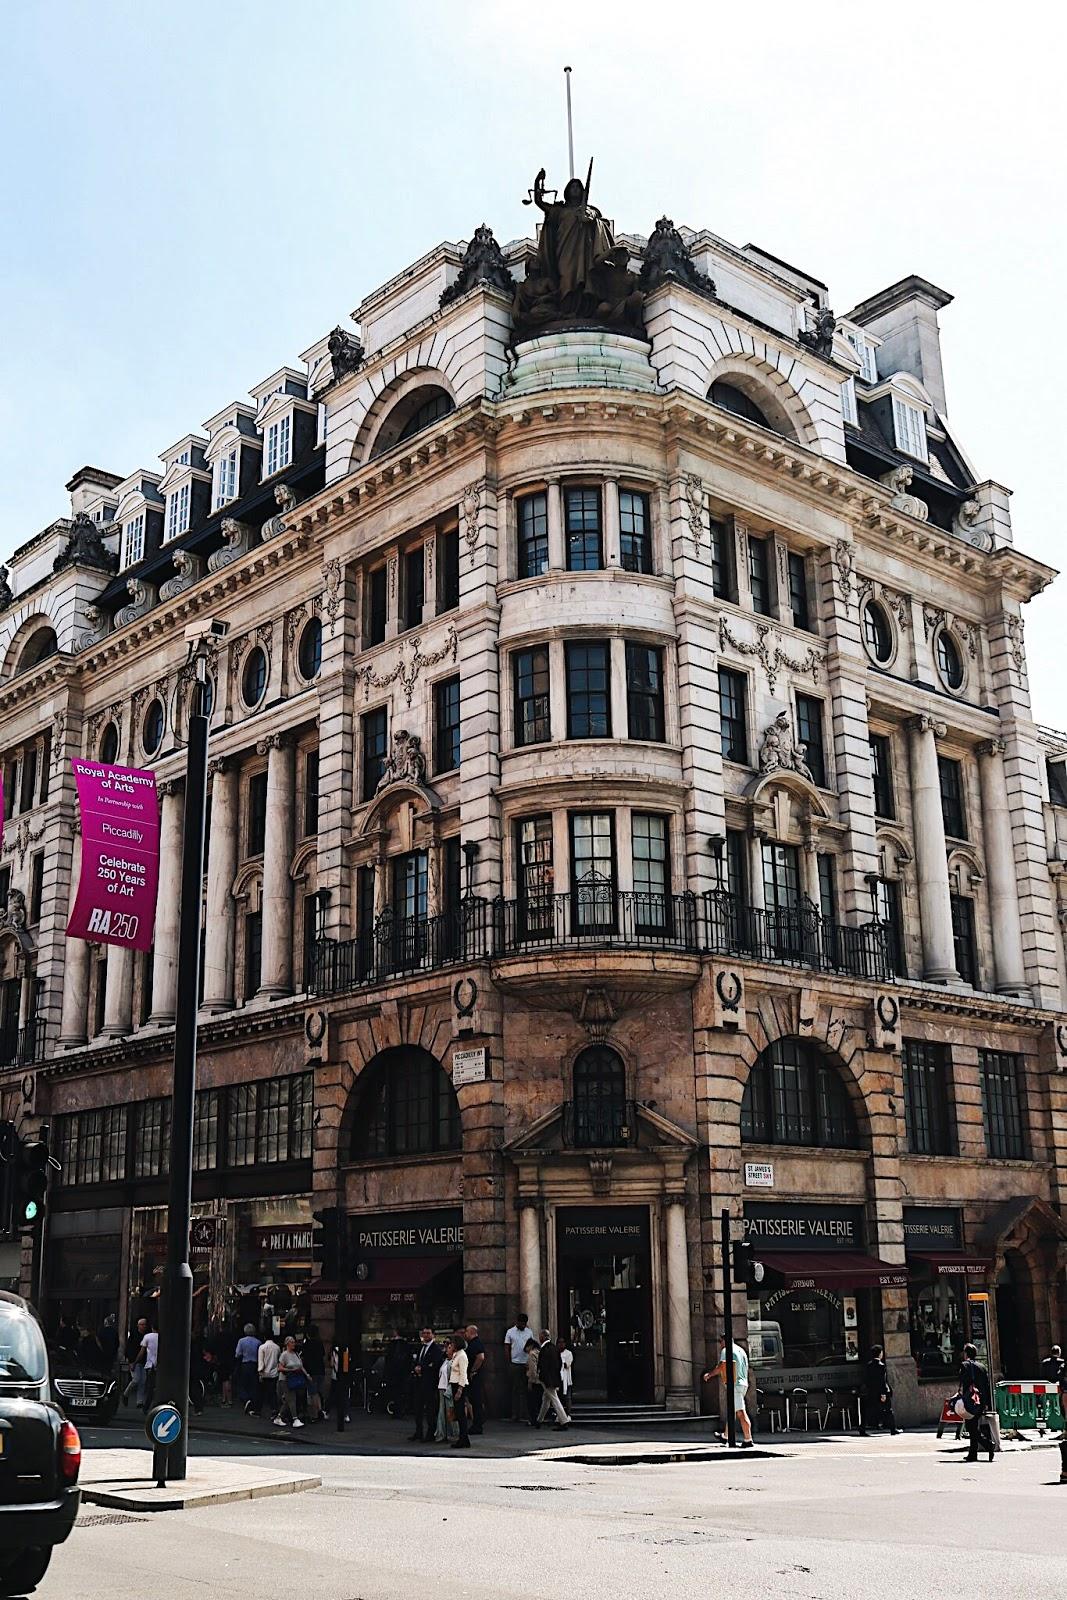 pauline-dress-blog-mode-deco-lifestyle-travel-voyage-europe-londres-angleterre-idees-visites-parcours-touristique-instagram-instagrammable-lieux